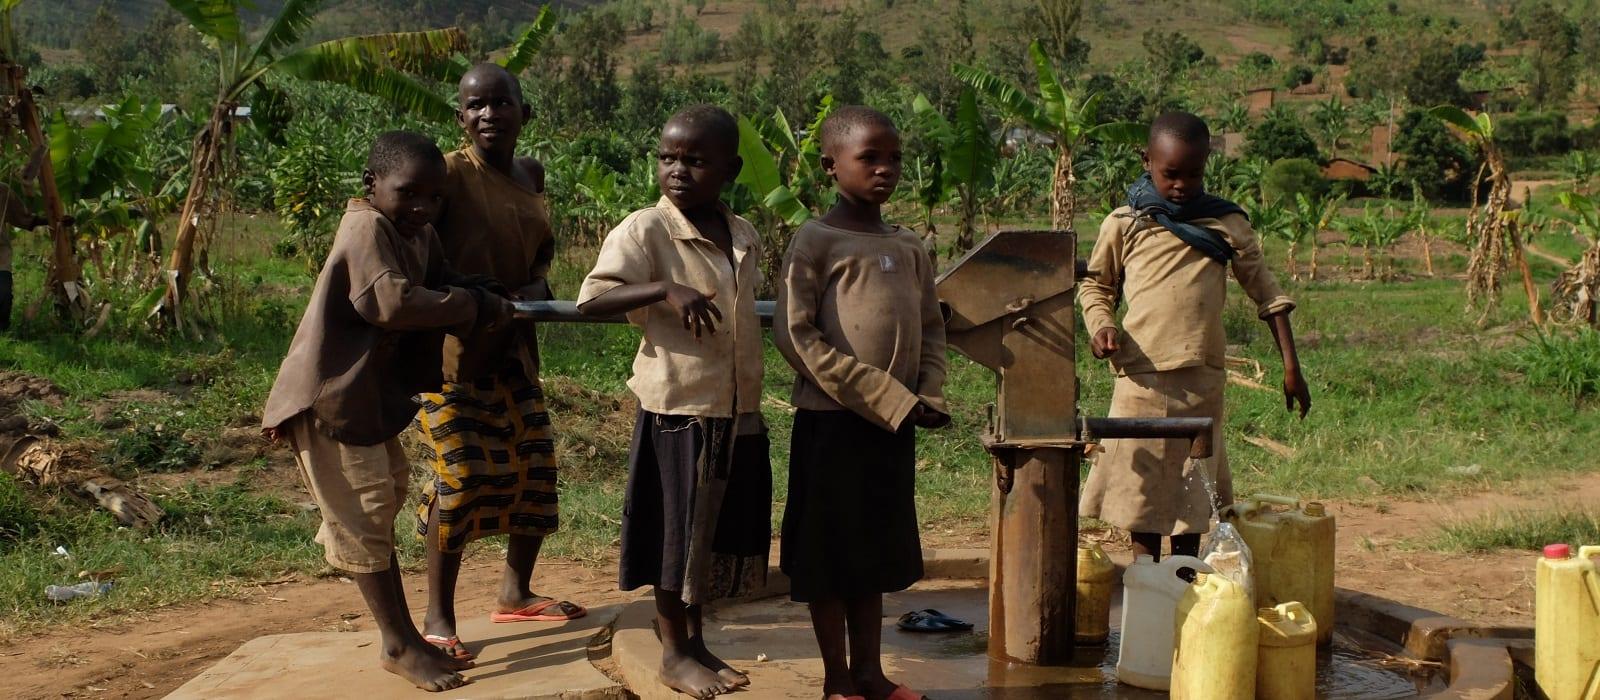 Simplyhealth - Carbon neutral - Uganda Borehole Project